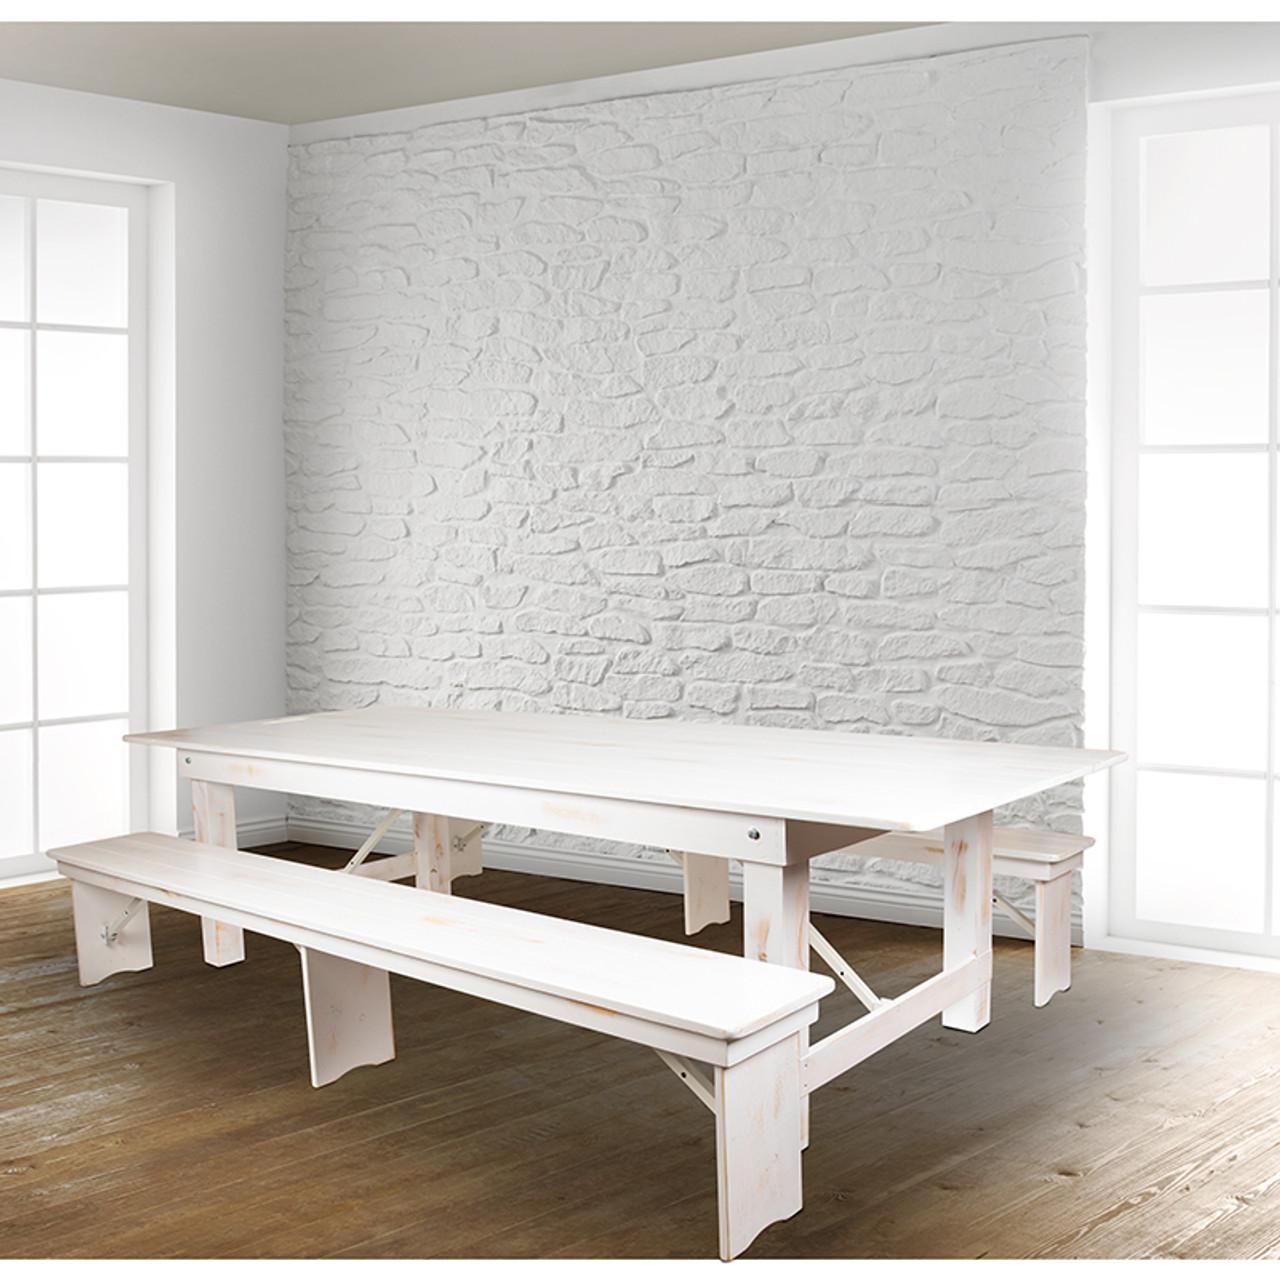 9 X40 White Table 2 Bench Set Xa Farm 6 Wh Gg Furniture East Inc